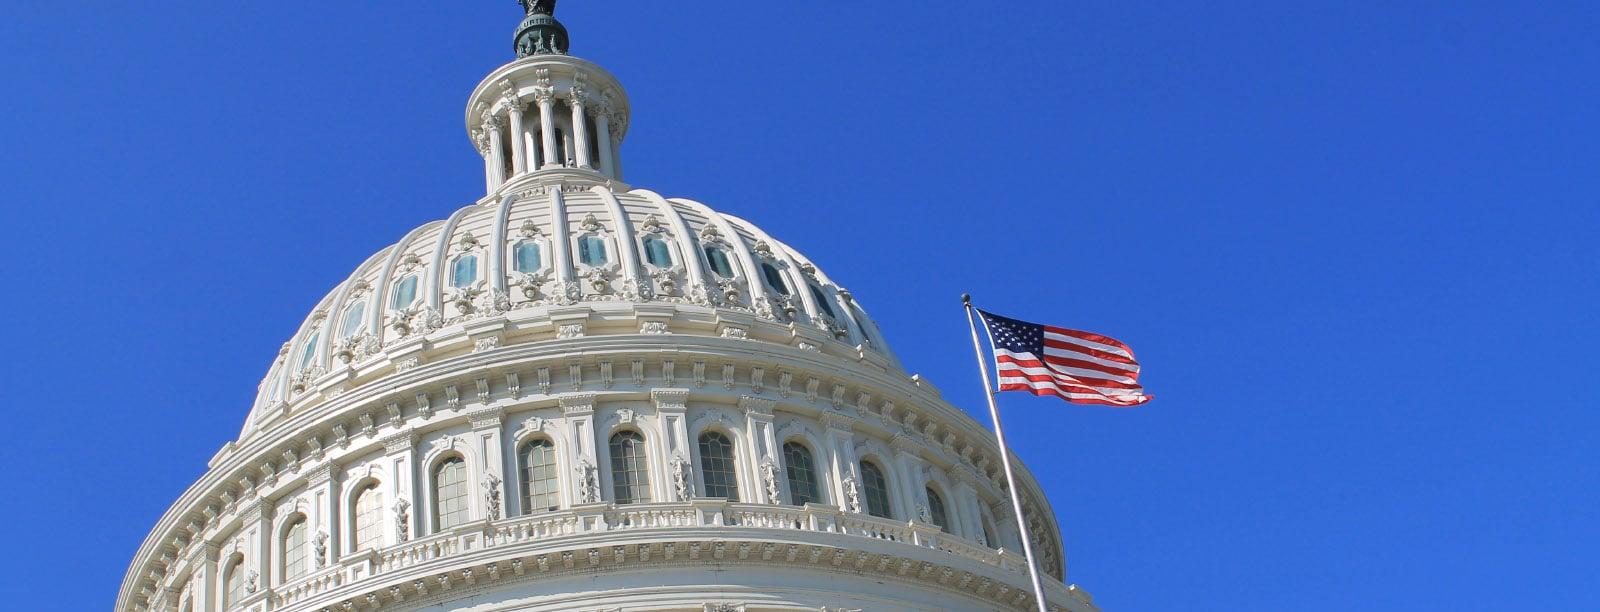 USA Capitol Building